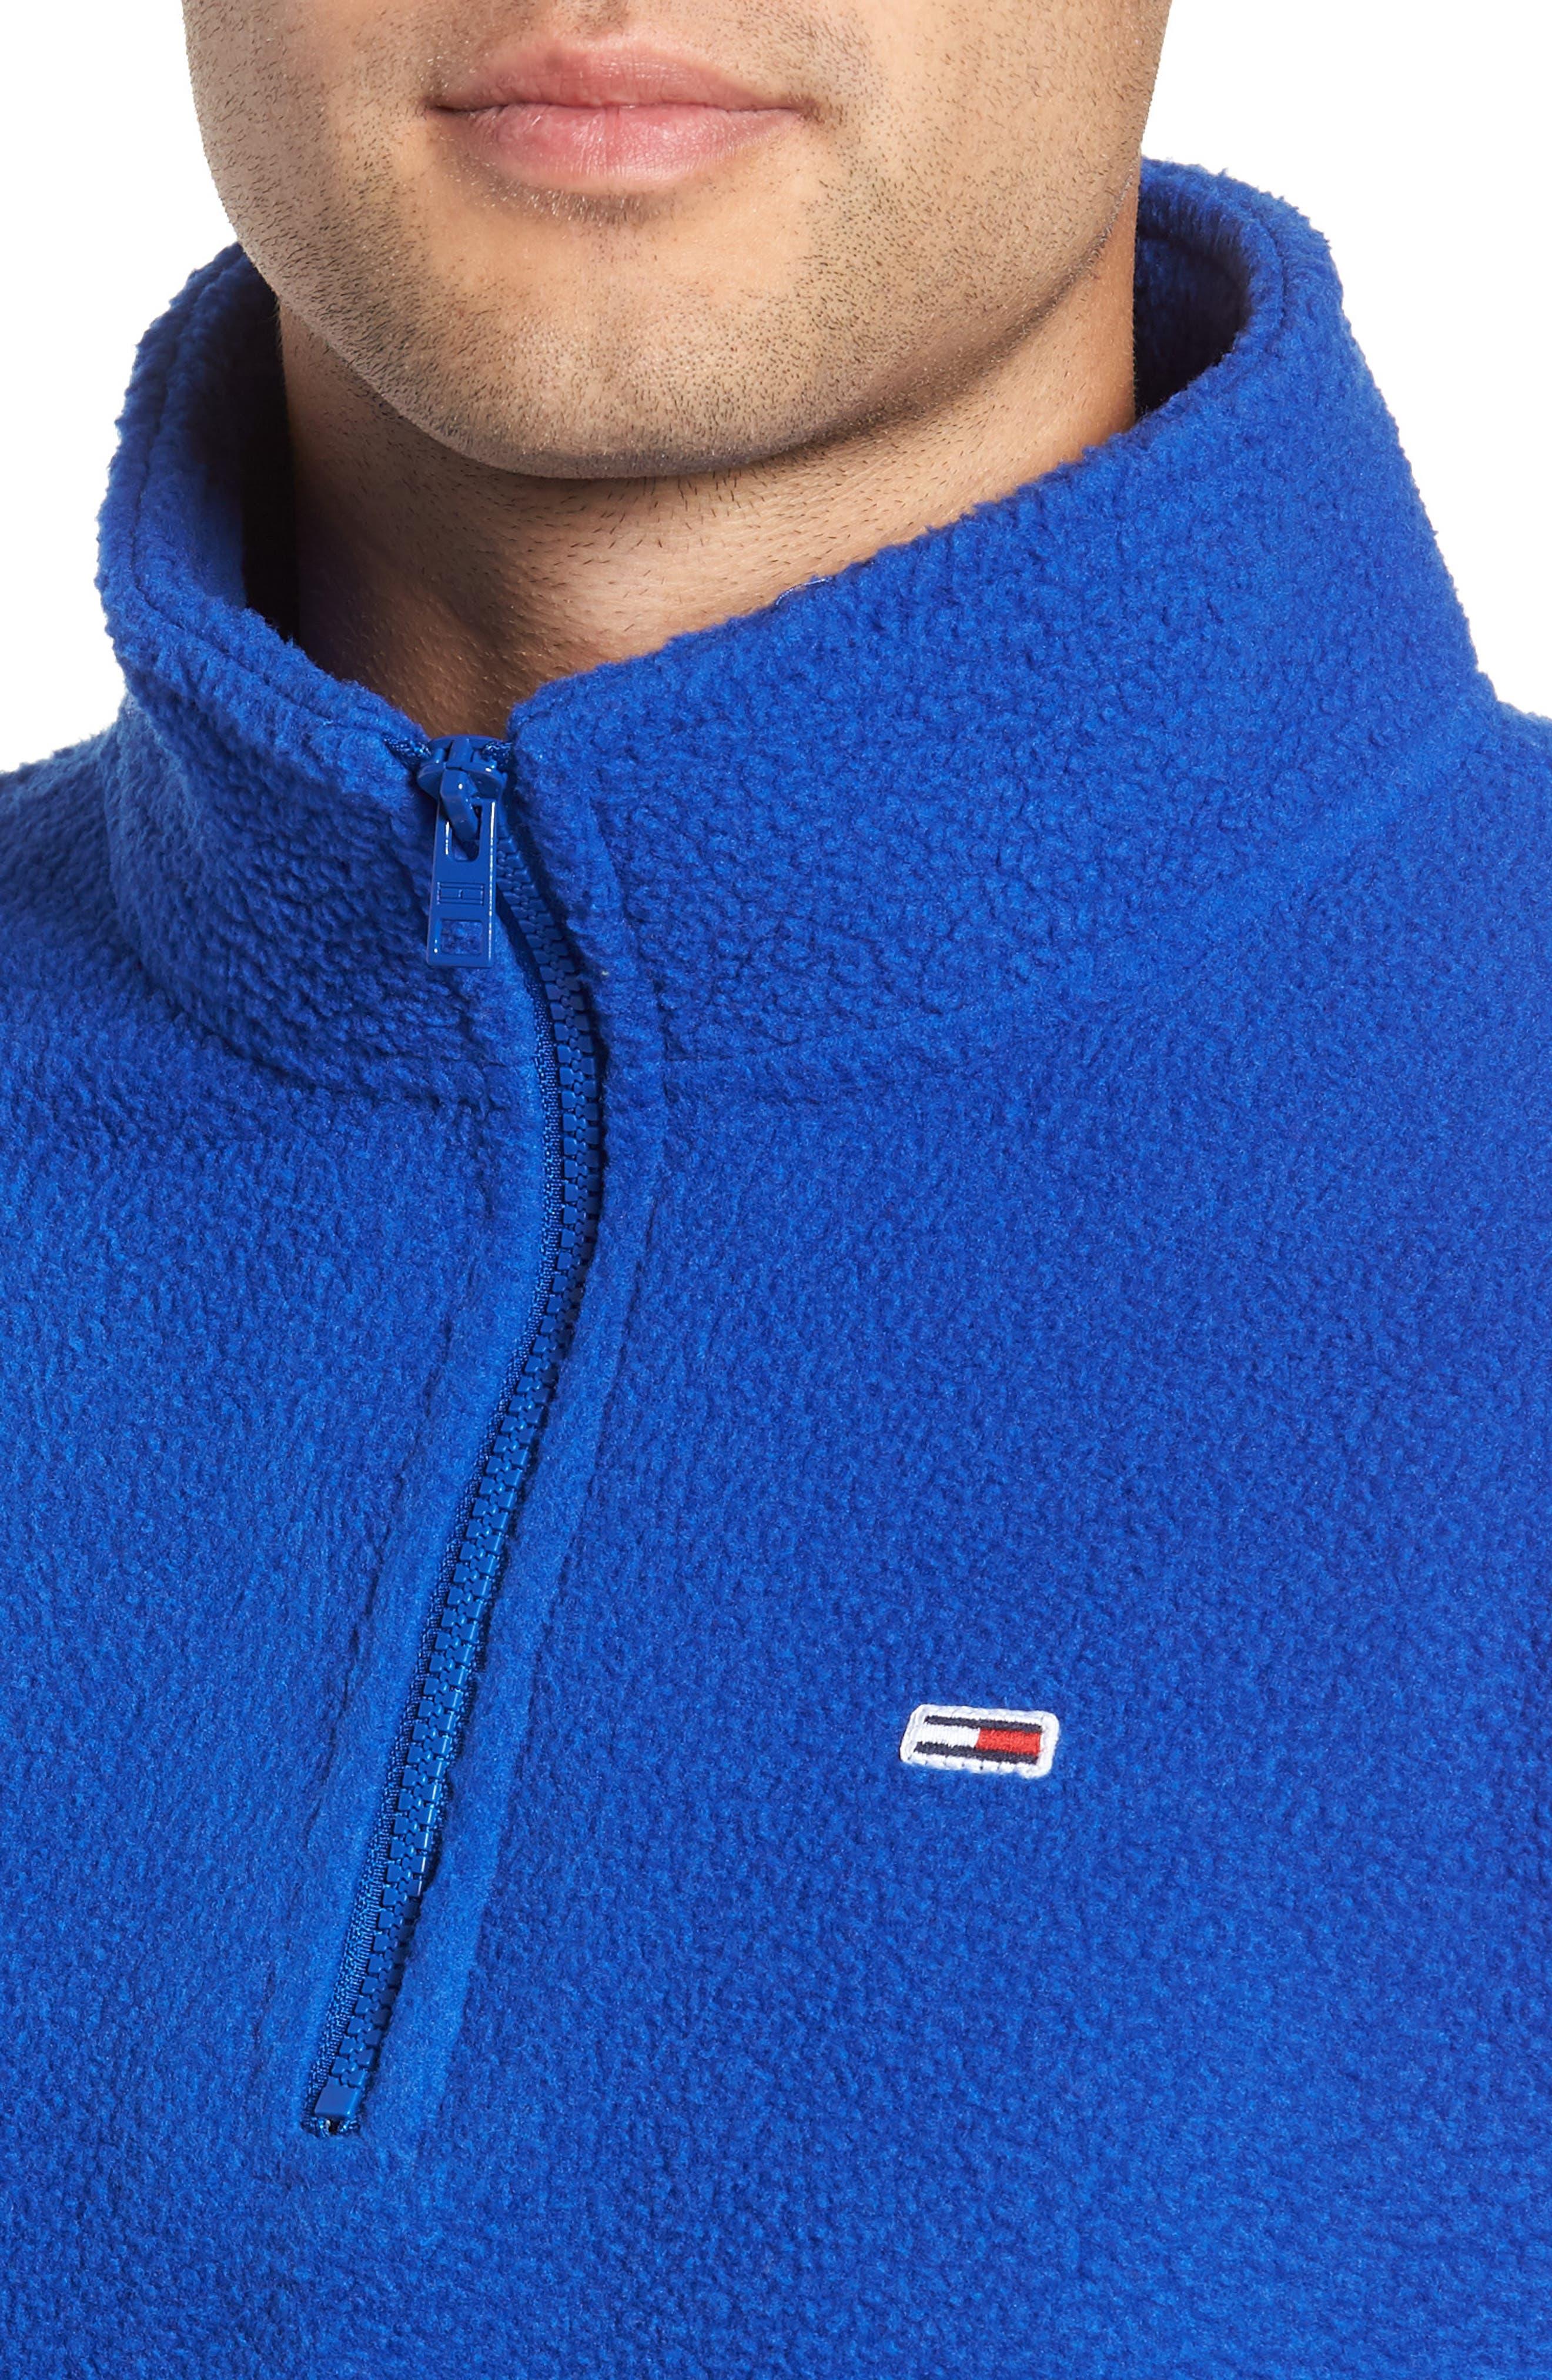 TJM Classics Half Zip Fleece Pullover,                             Alternate thumbnail 4, color,                             SURF THE WEB